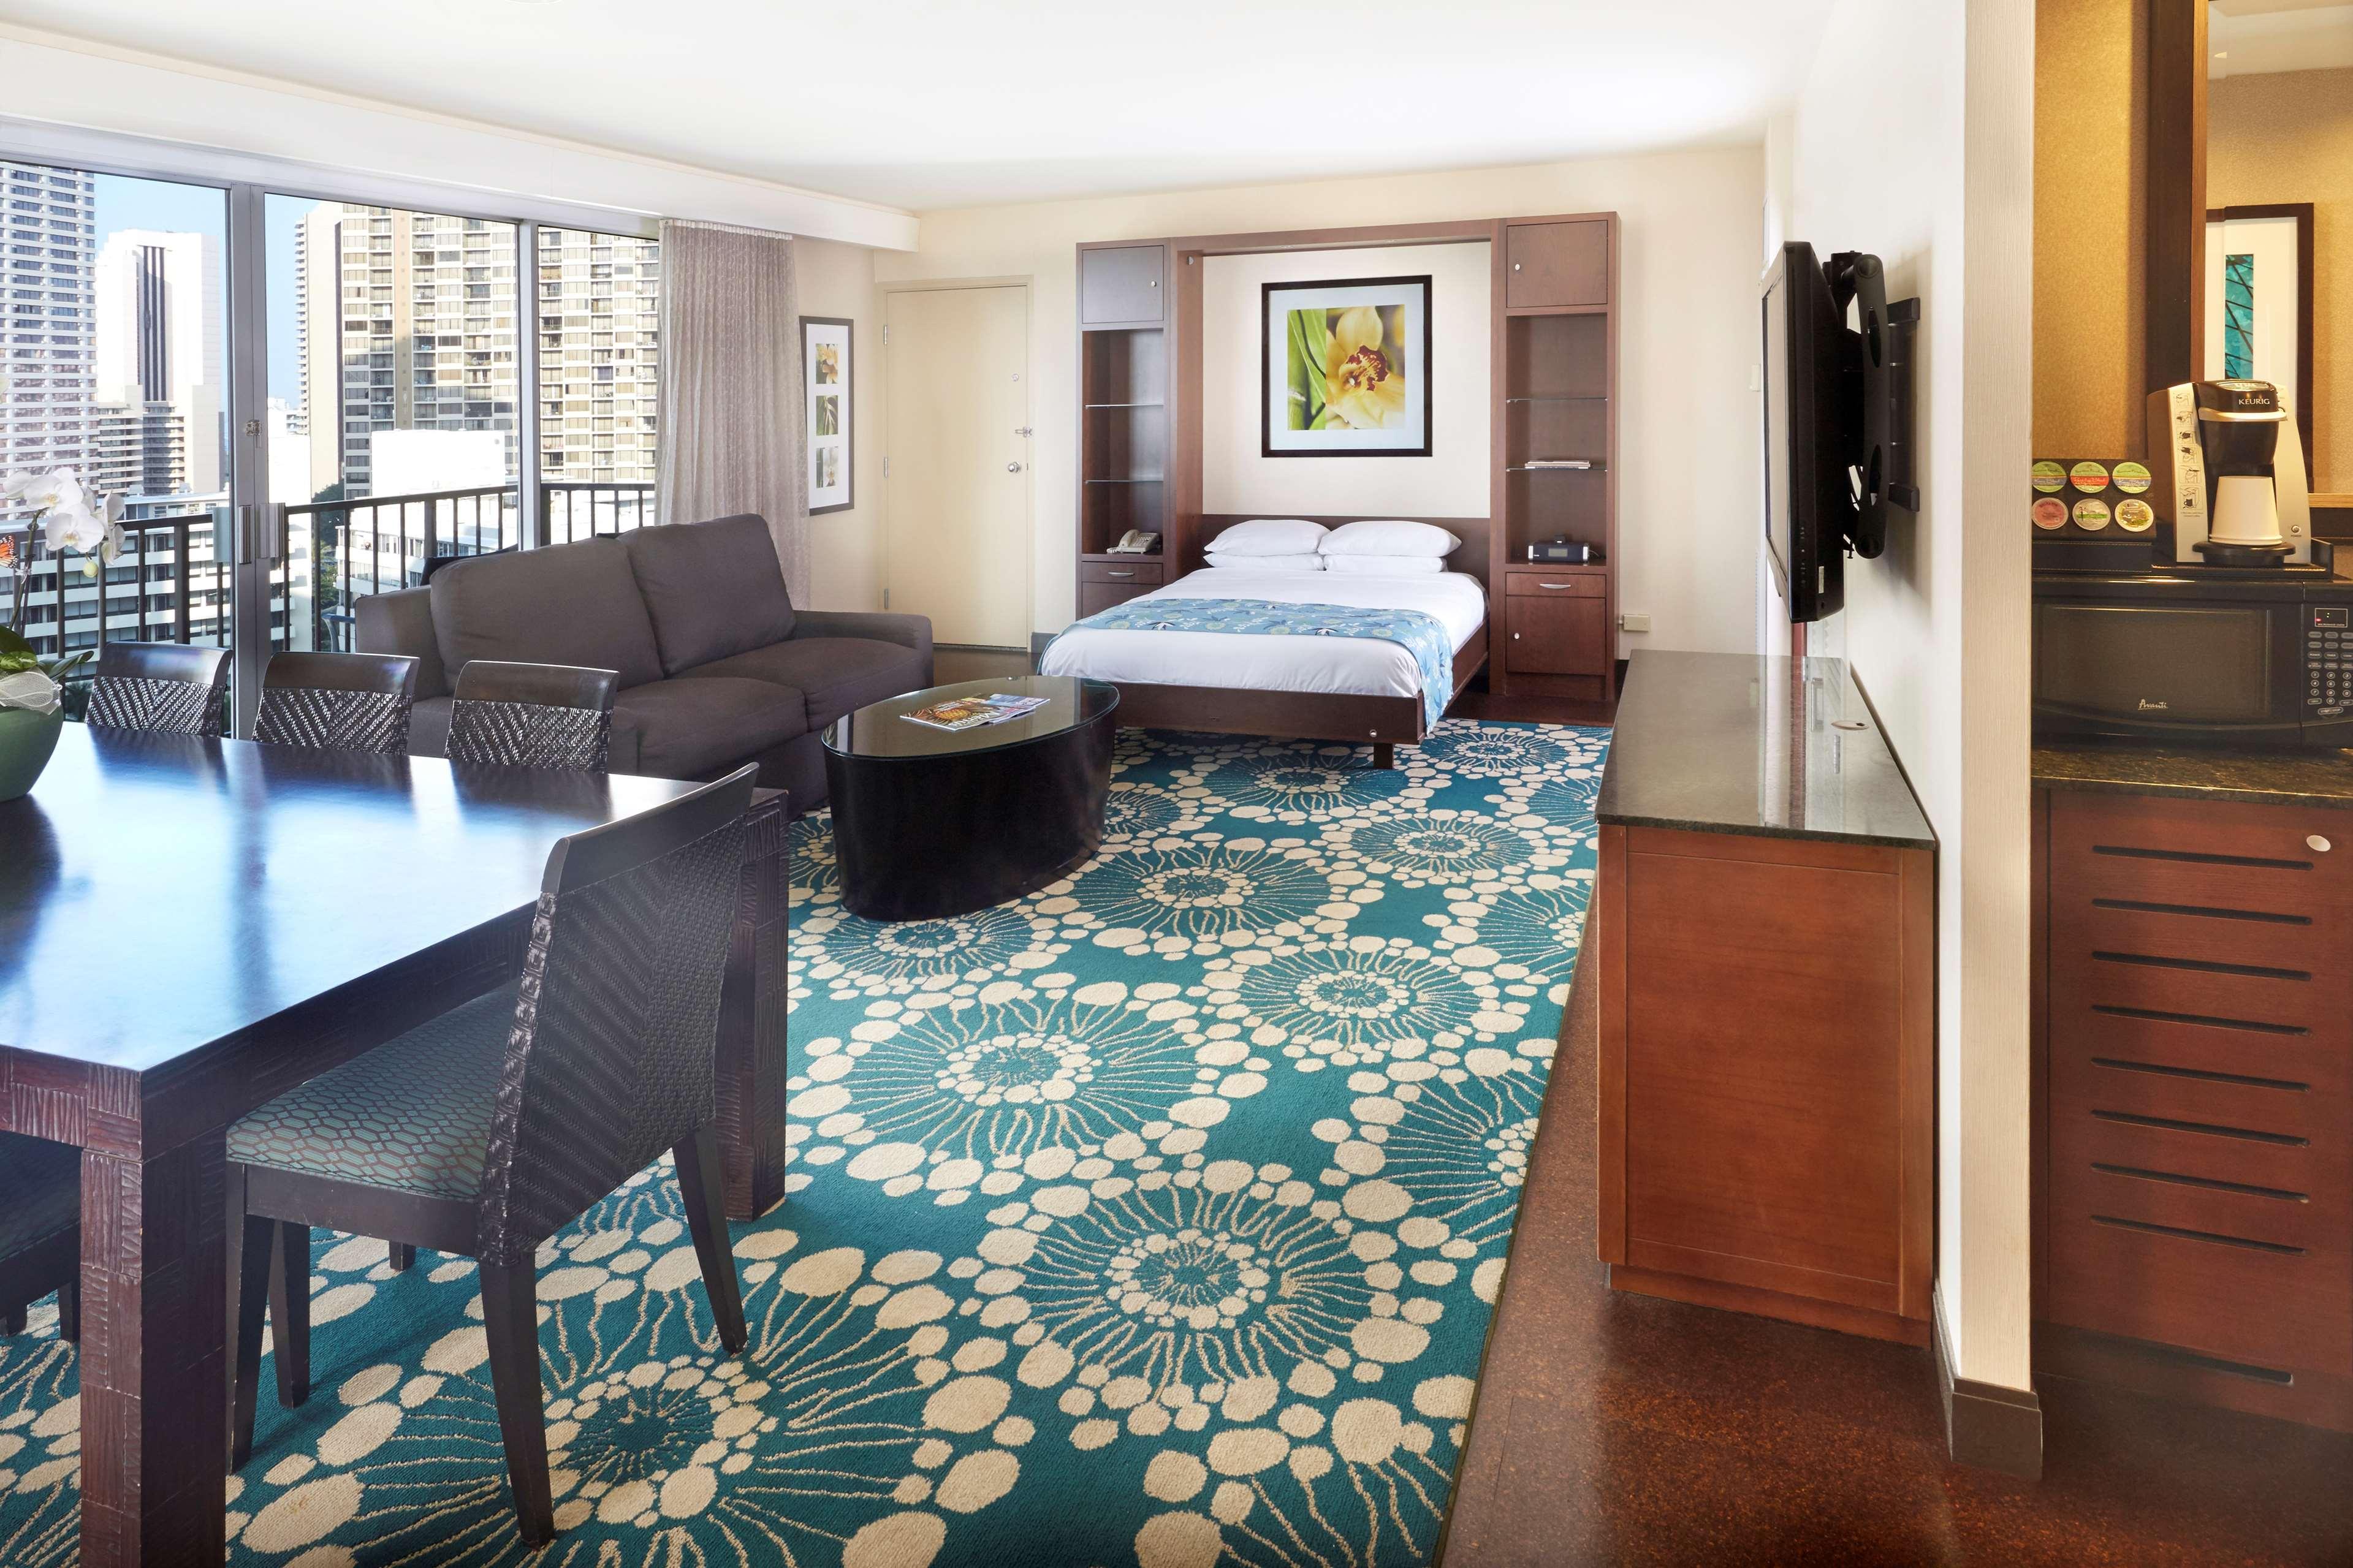 DoubleTree by Hilton Hotel Alana - Waikiki Beach image 20